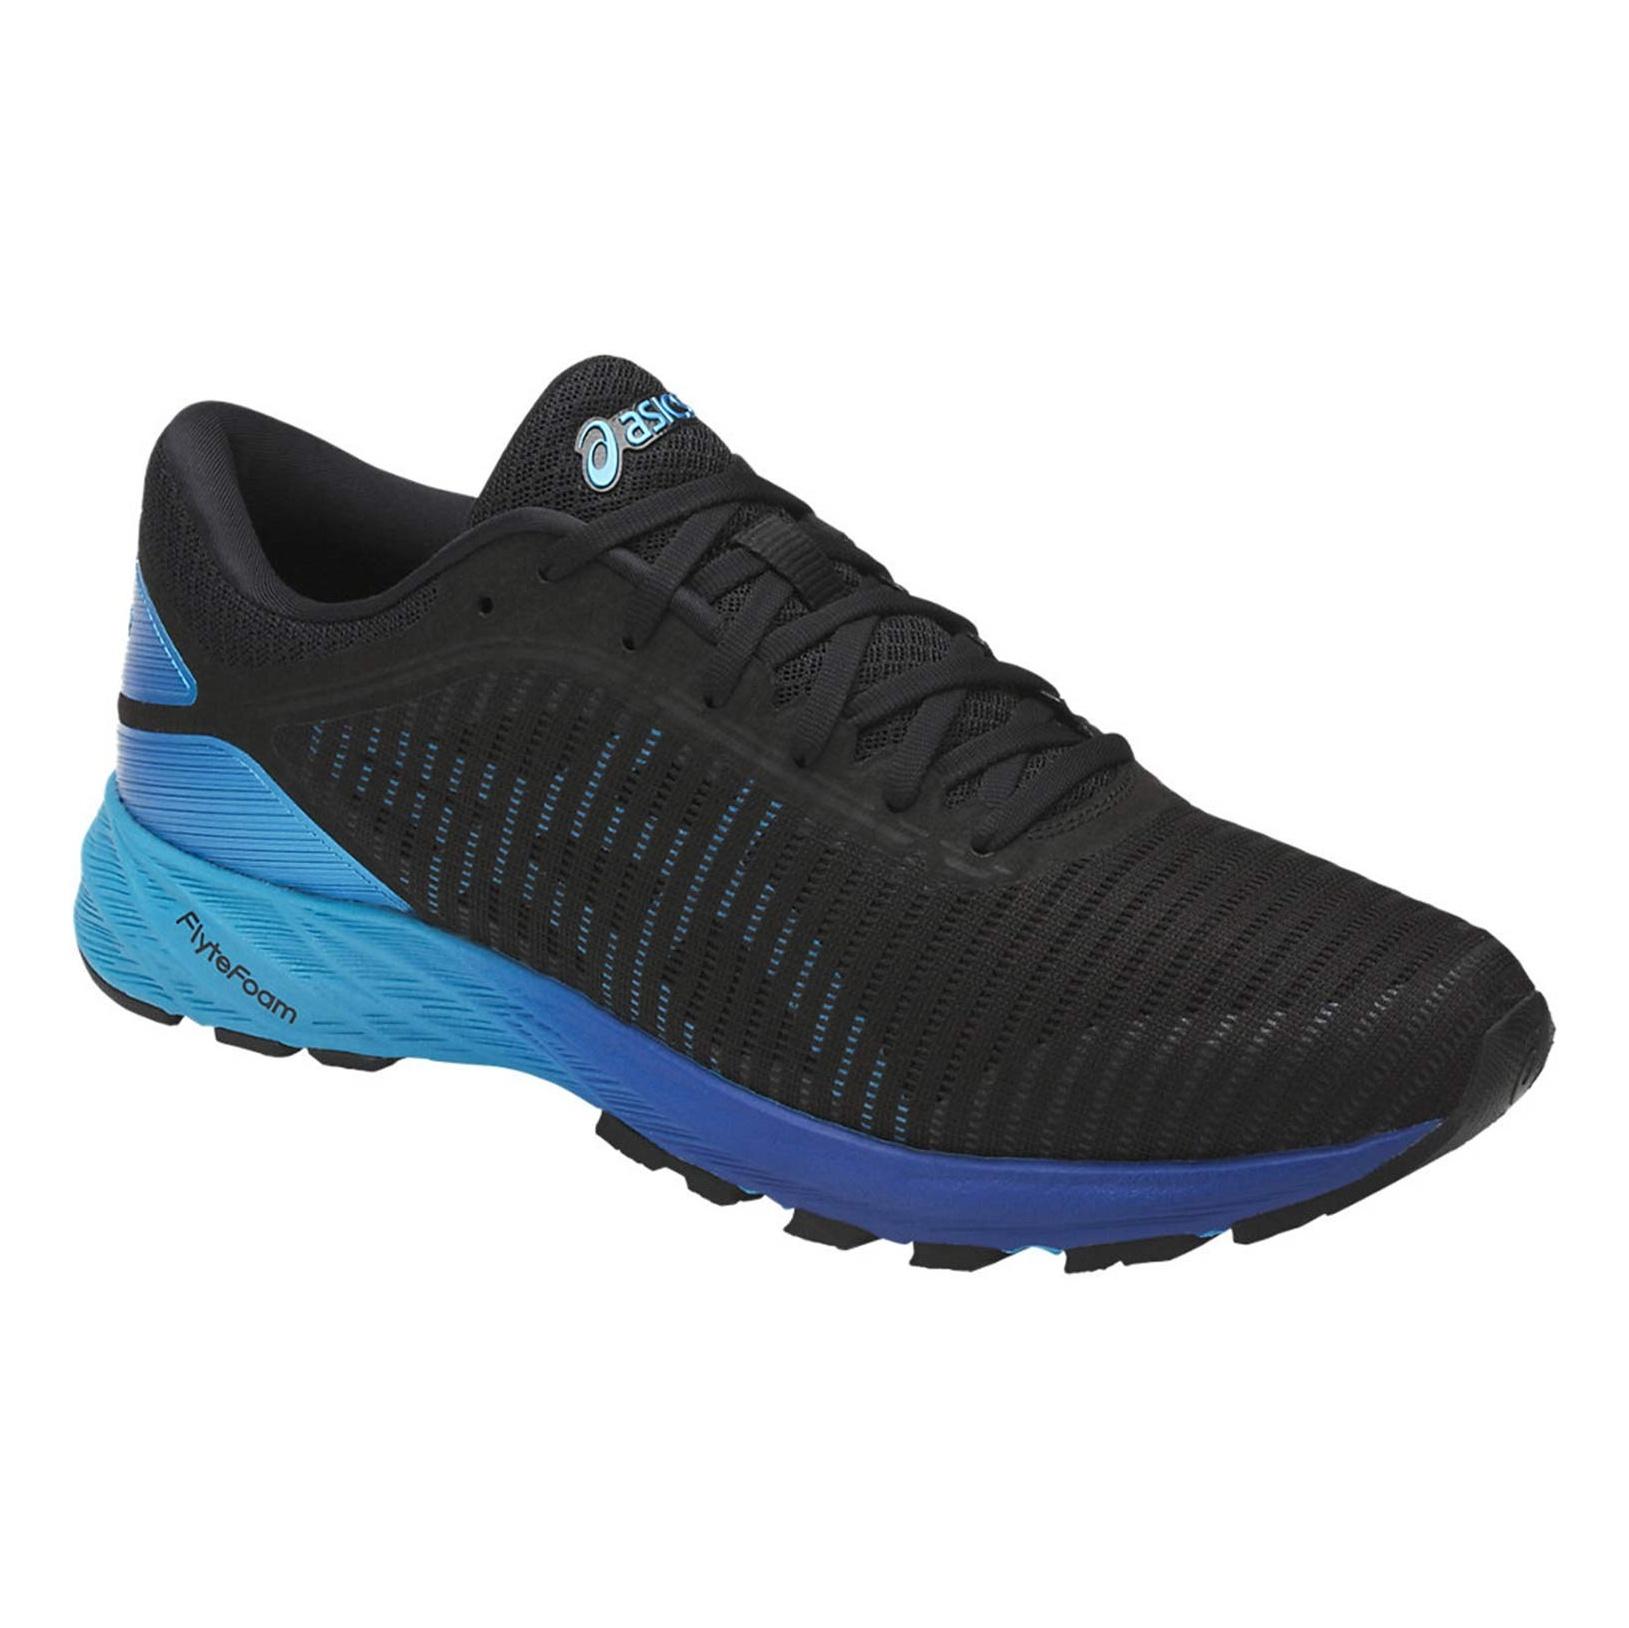 کفش دویدن بندی مردانه DynaFlyte 2 - اسیکس - مشکی - 5